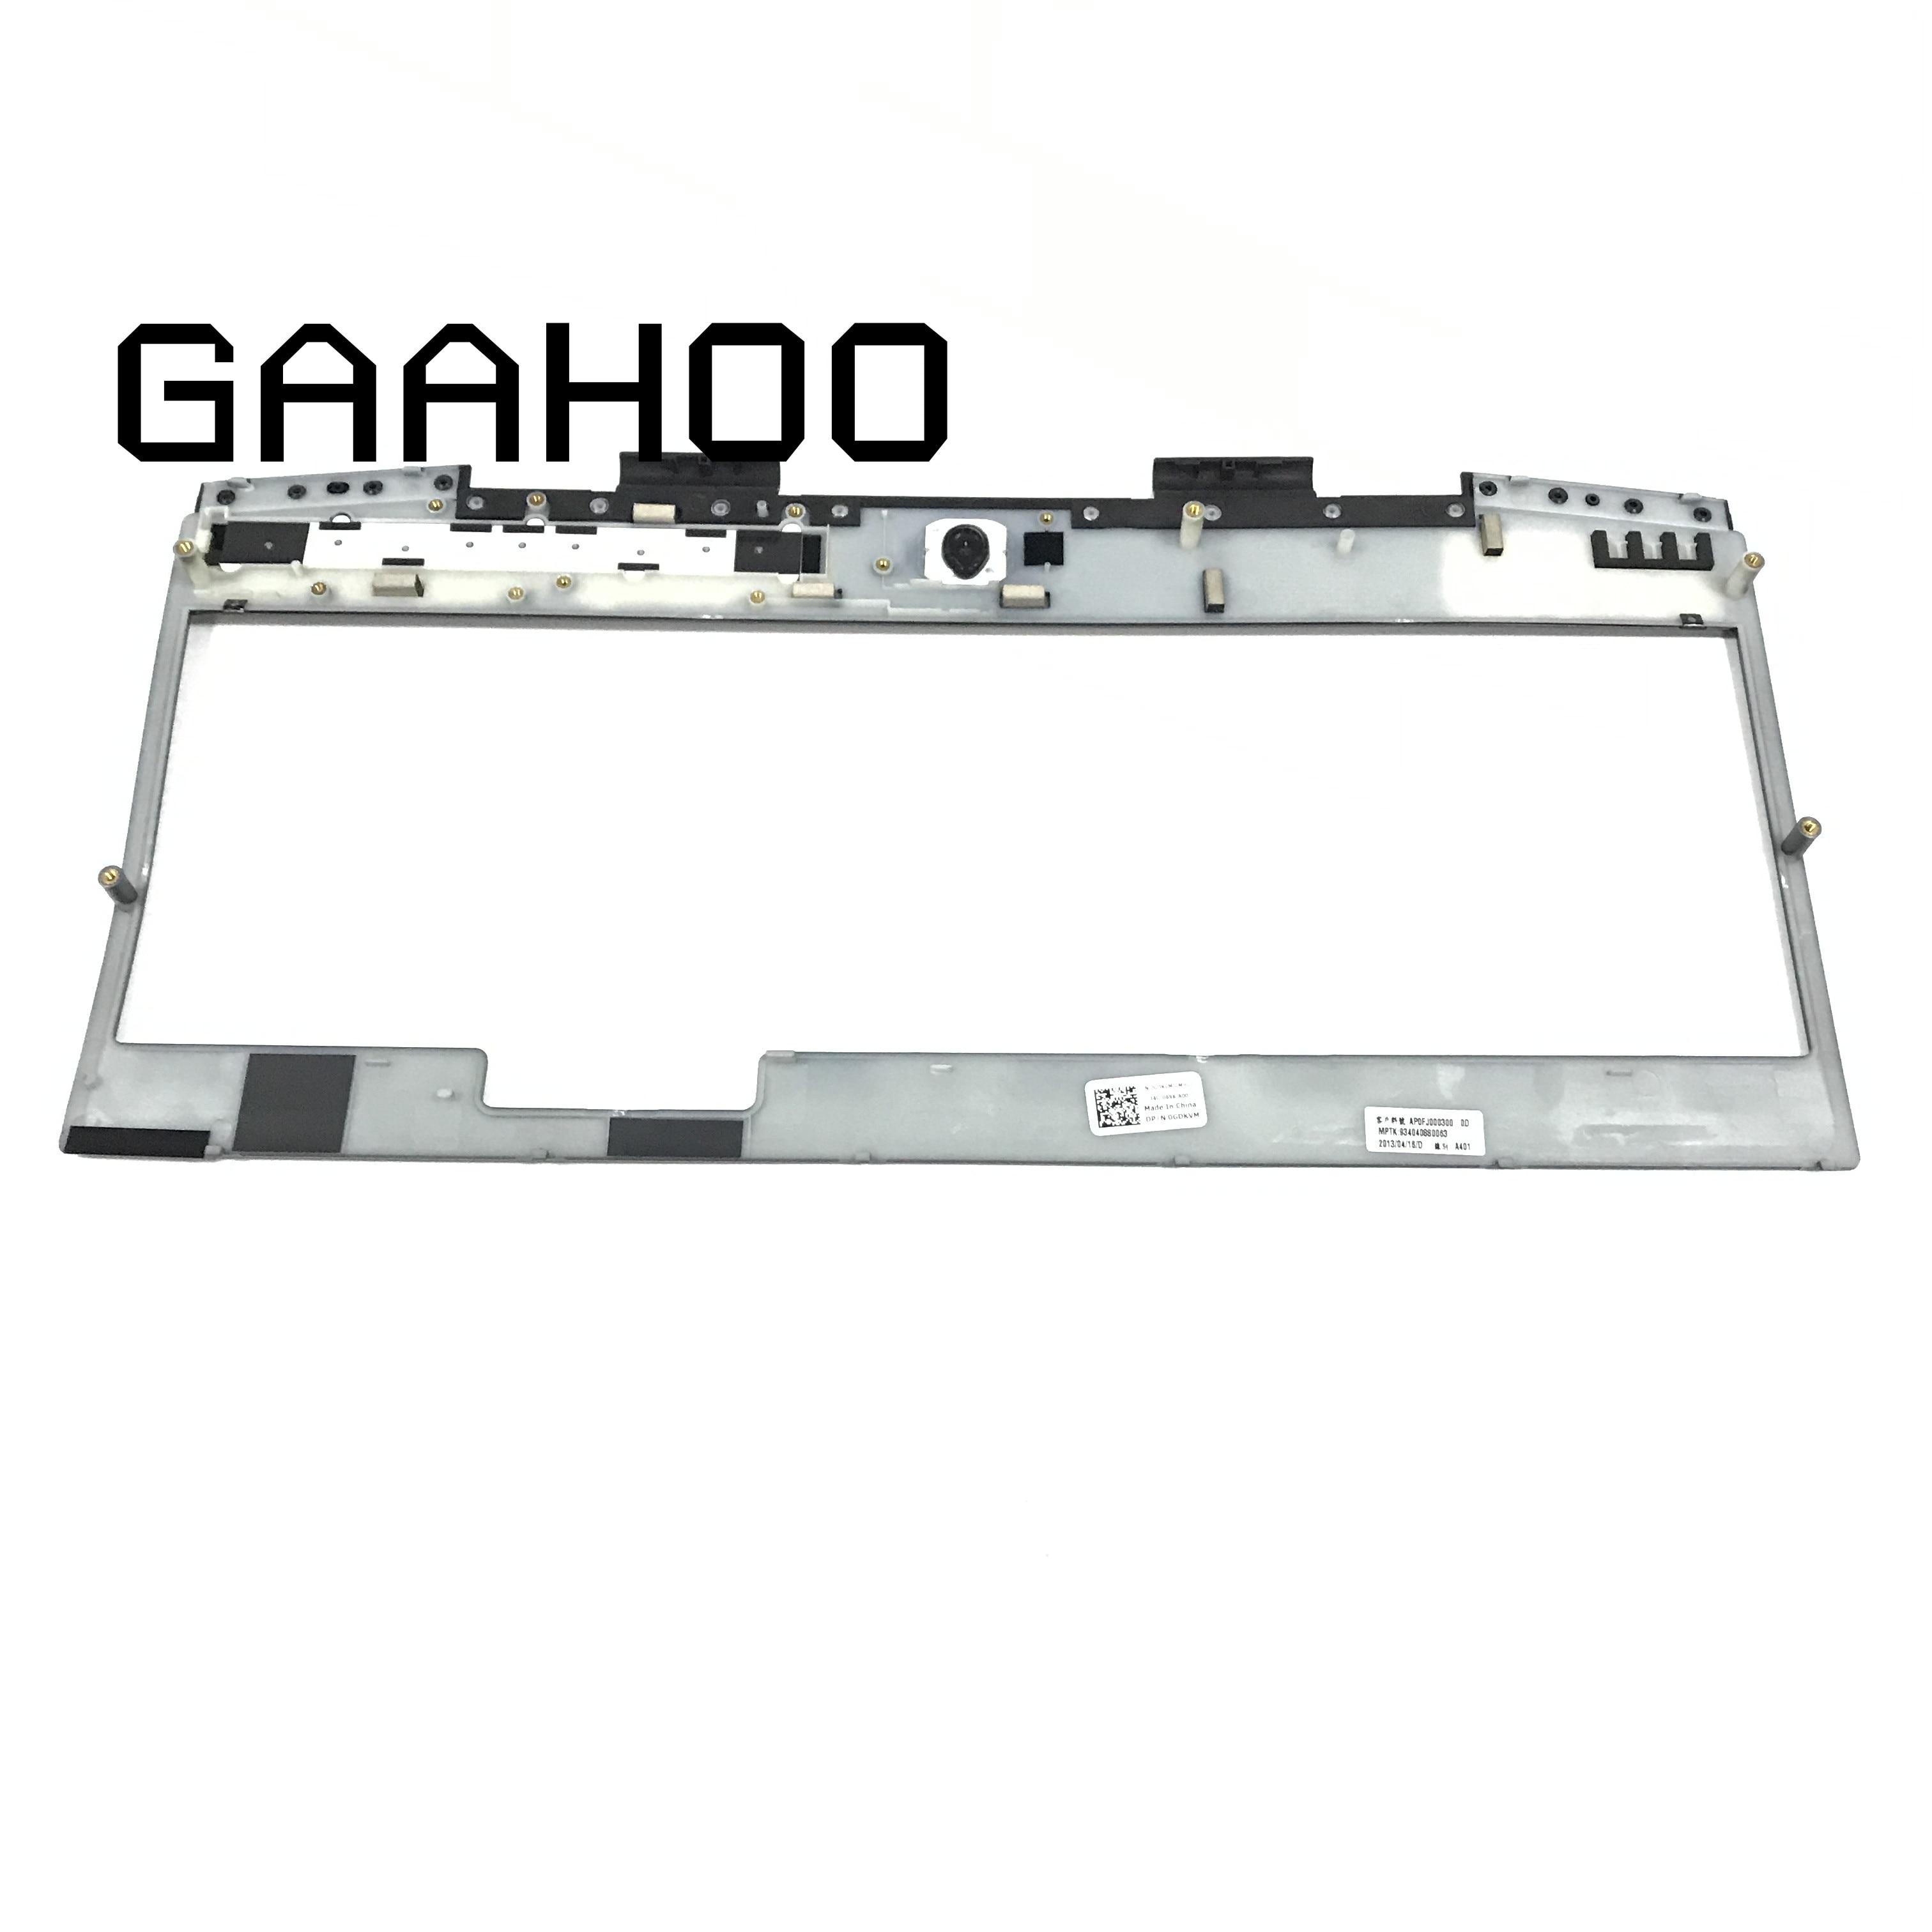 Brand new original laptop parts for DELL ALIENWARE M18X R1 R2 Keyboard bezel trim